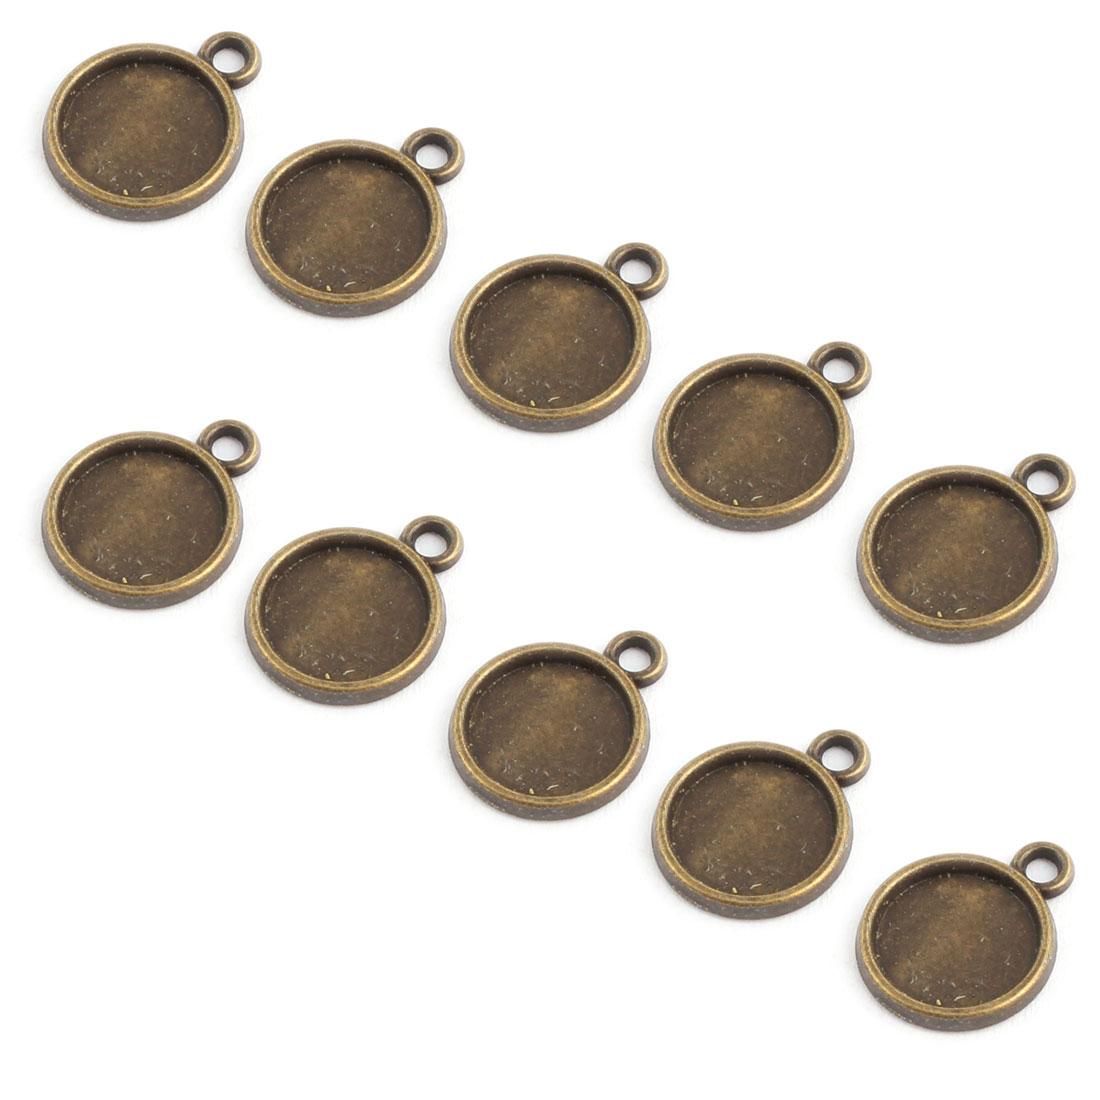 Household Copper Alloy DIY Retro Style Round Pendant Trays Bronze Tone 10mm Inner Dia 10 Pcs